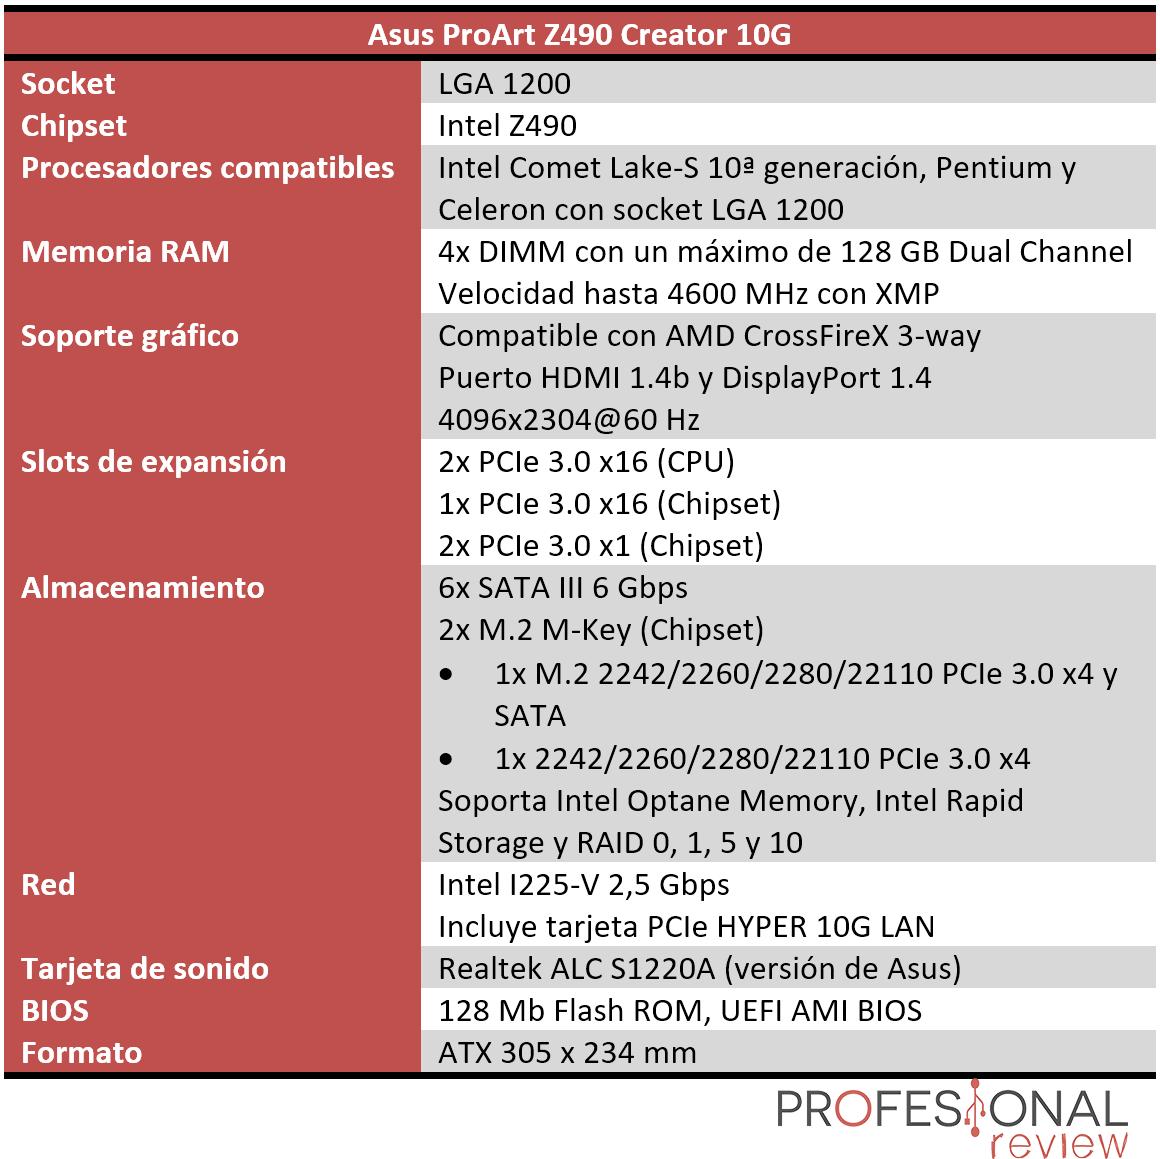 Asus ProArt Z490 Creator 10G Características